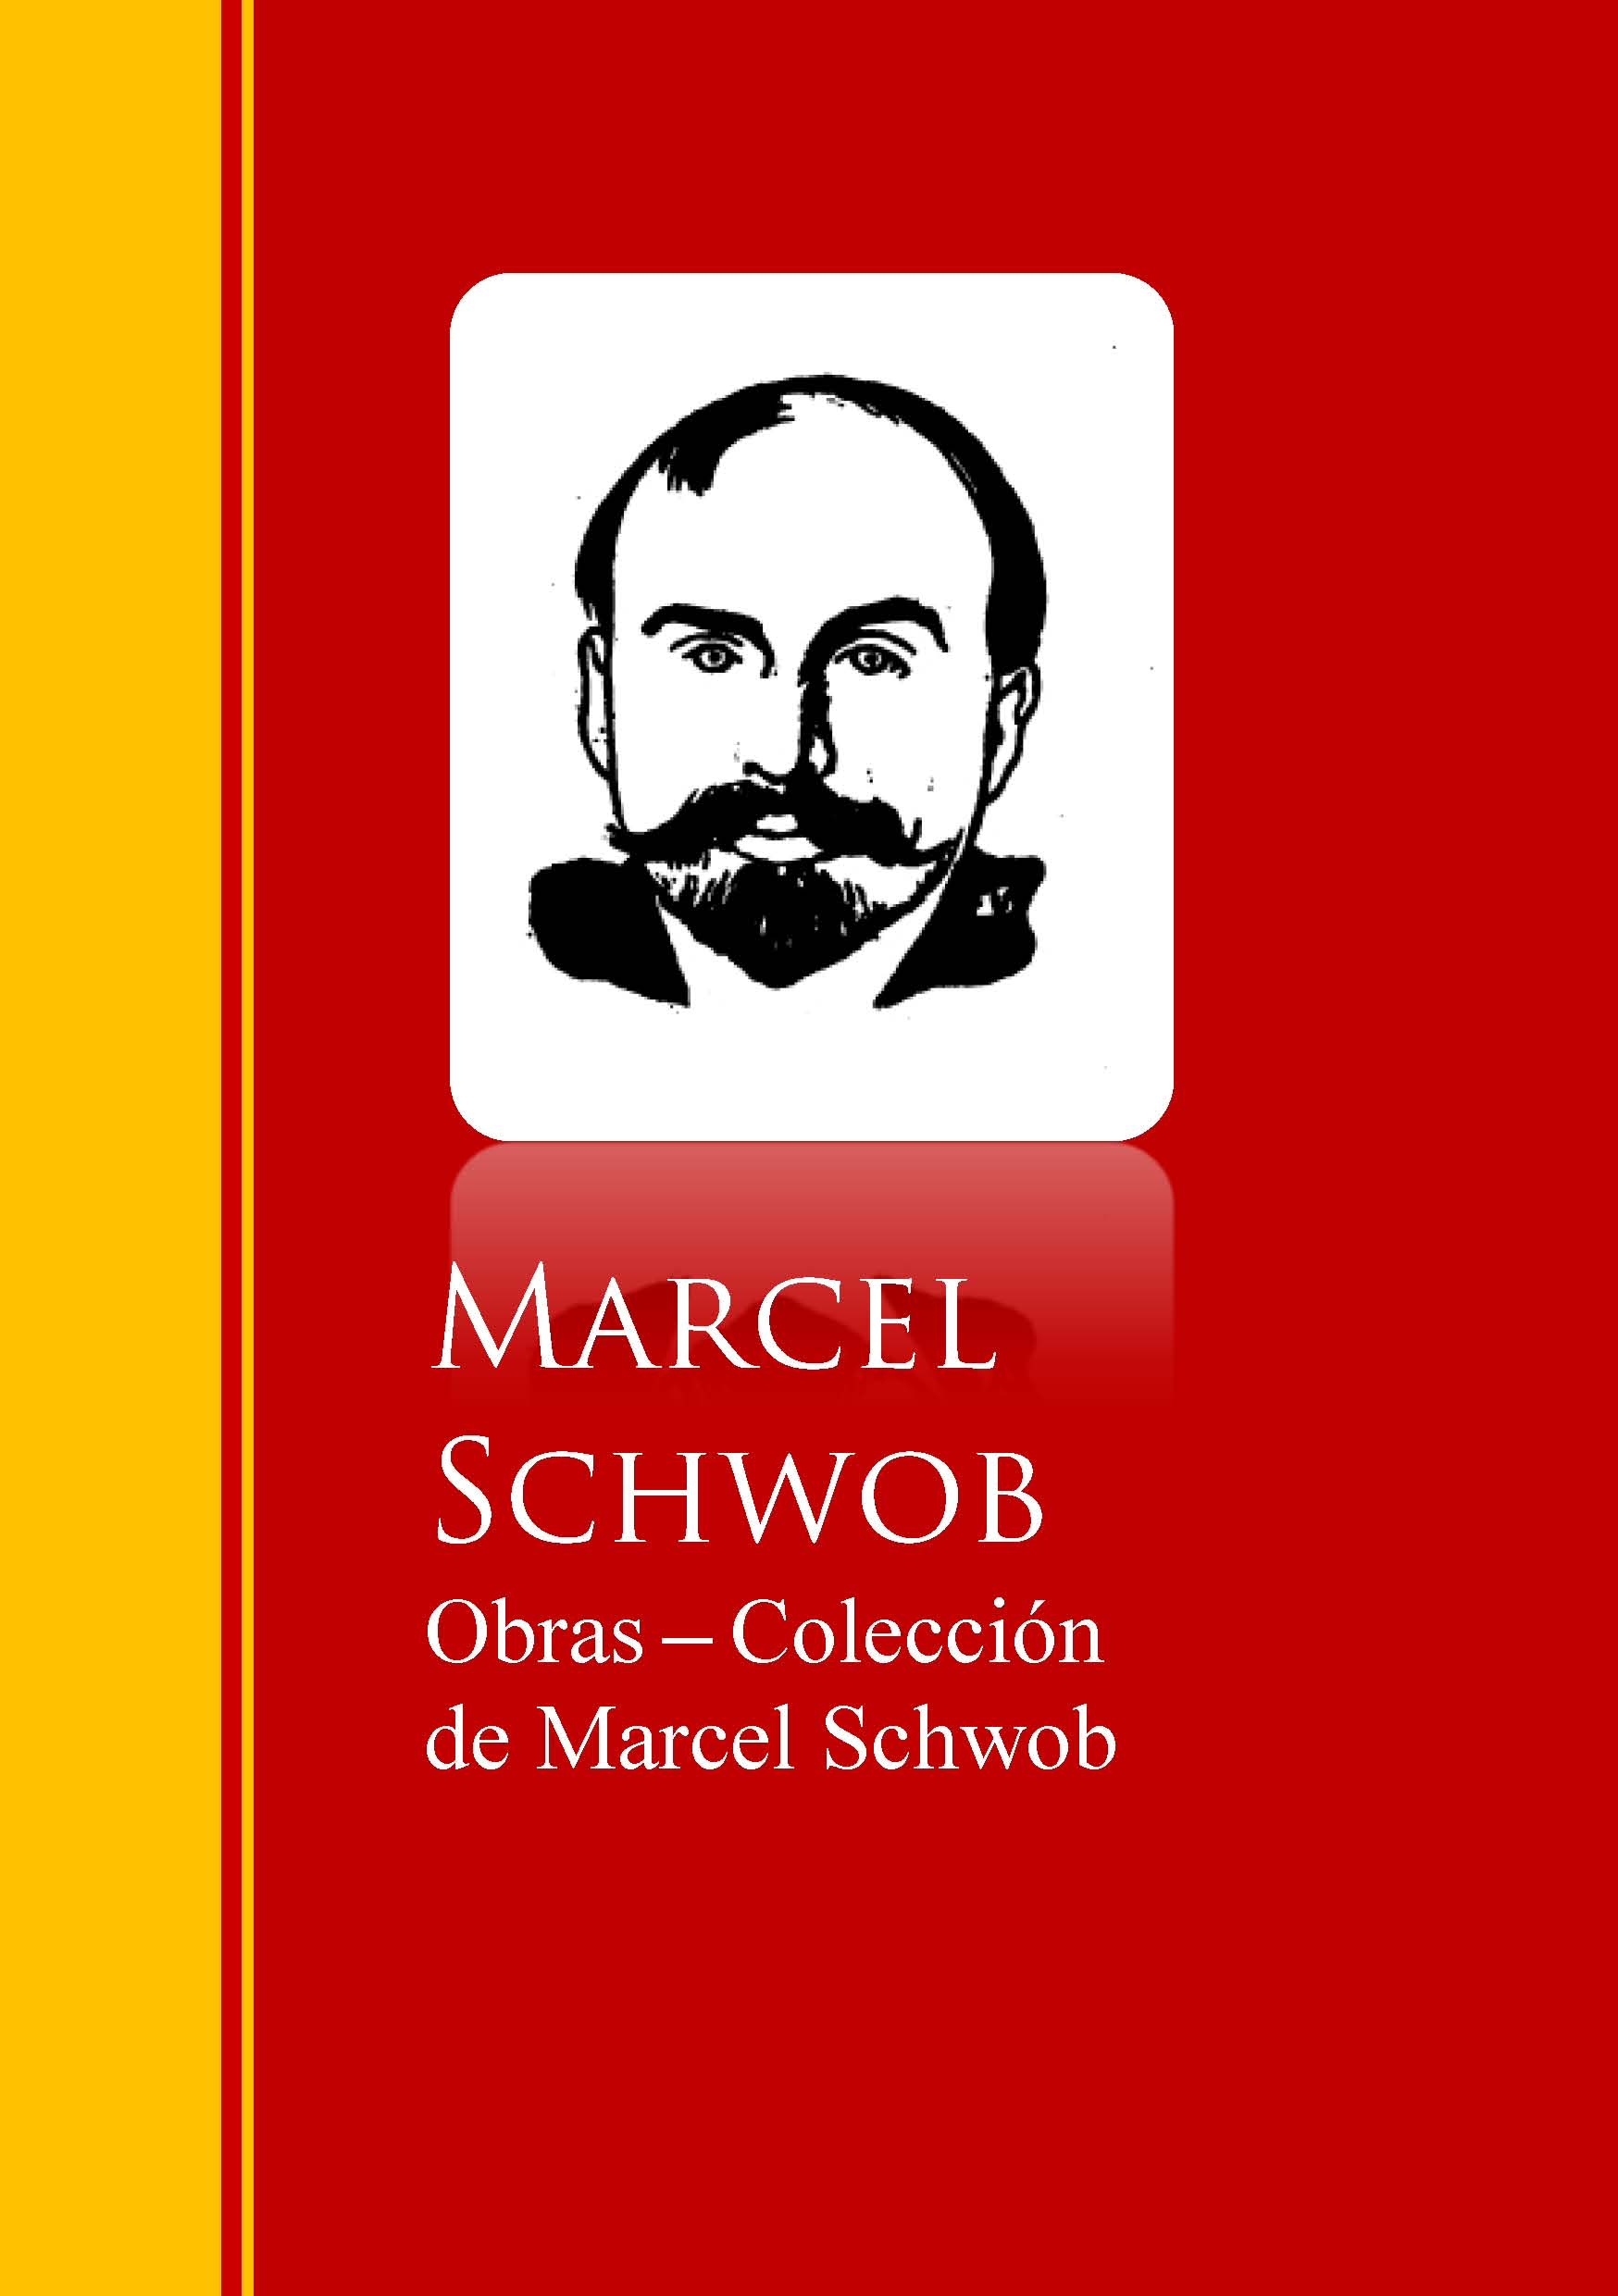 Marcel Schwob Obras - Coleccion de Marcel Schwob недорого